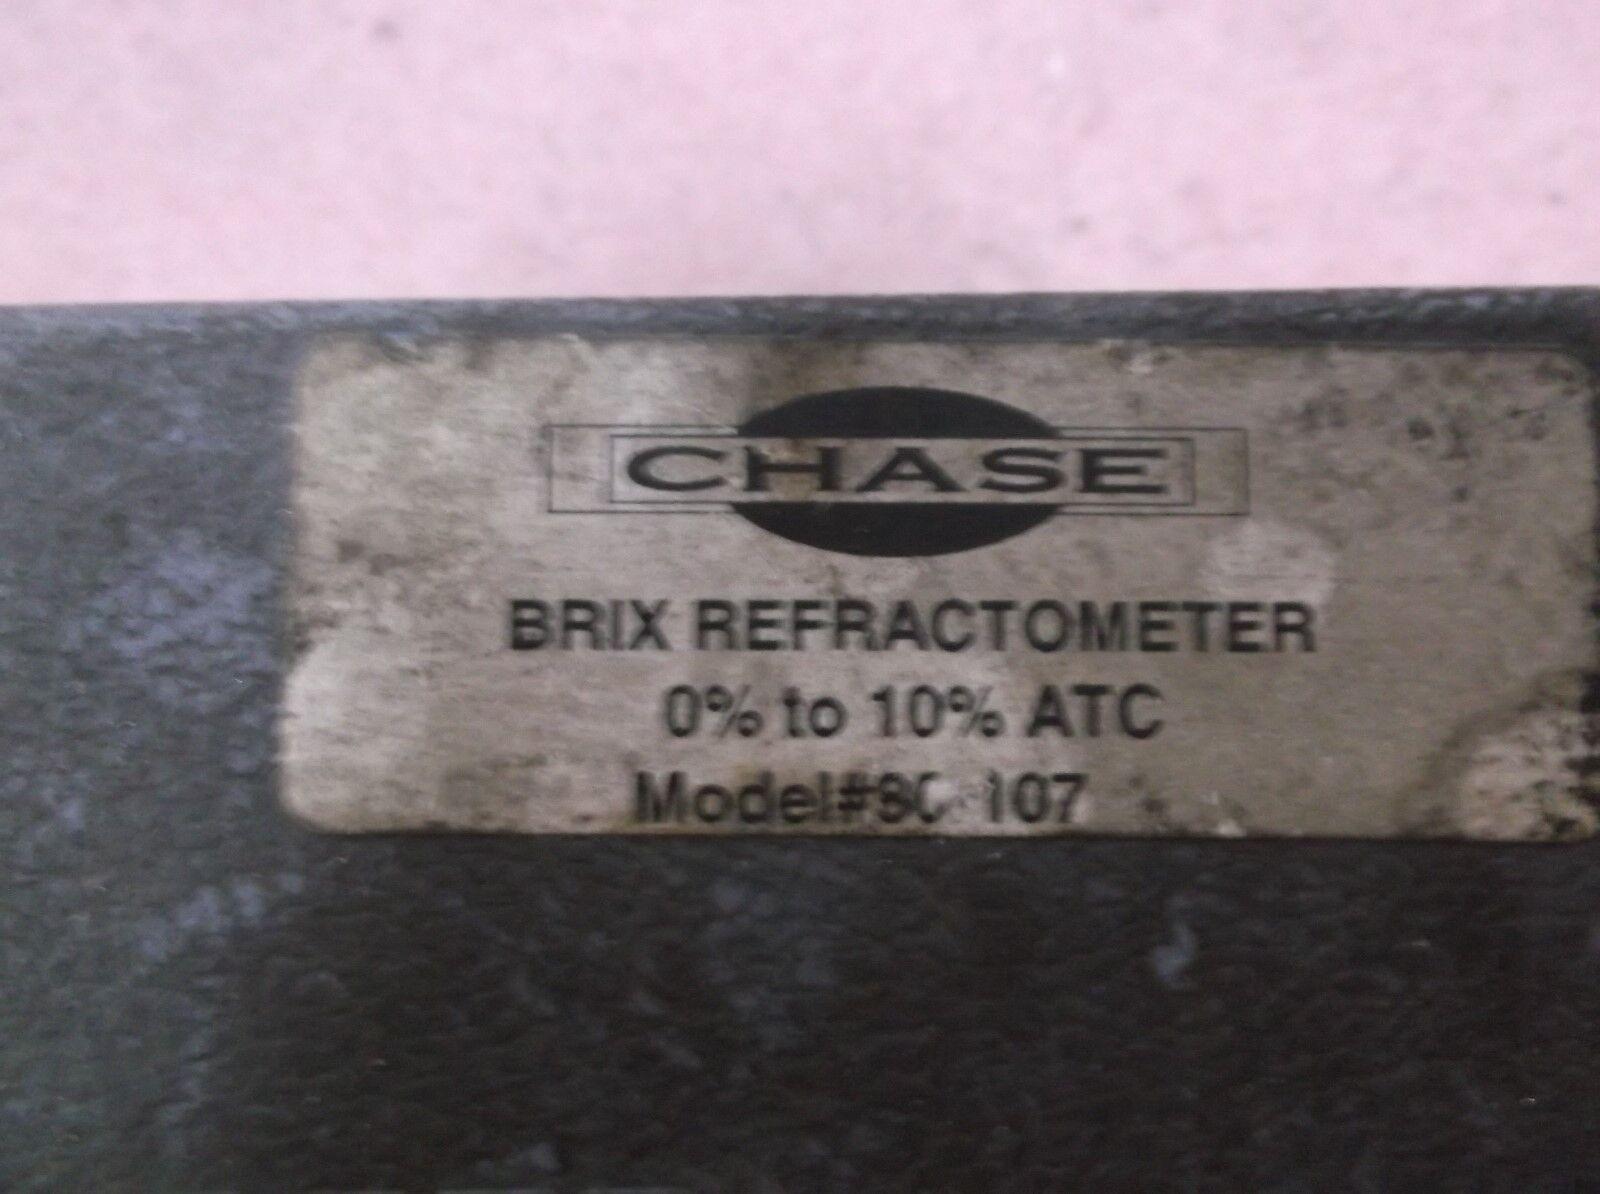 CHASE 80-107 HANDHELD BRIX REFRACTOMETER BRIX 0-10 ATC 1